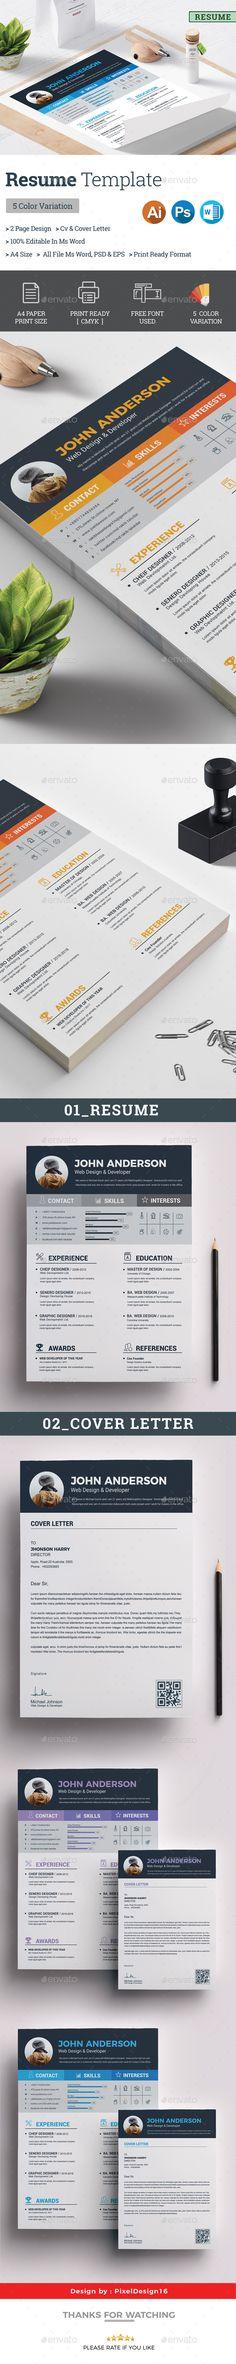 1552 best Resume Design images on Pinterest